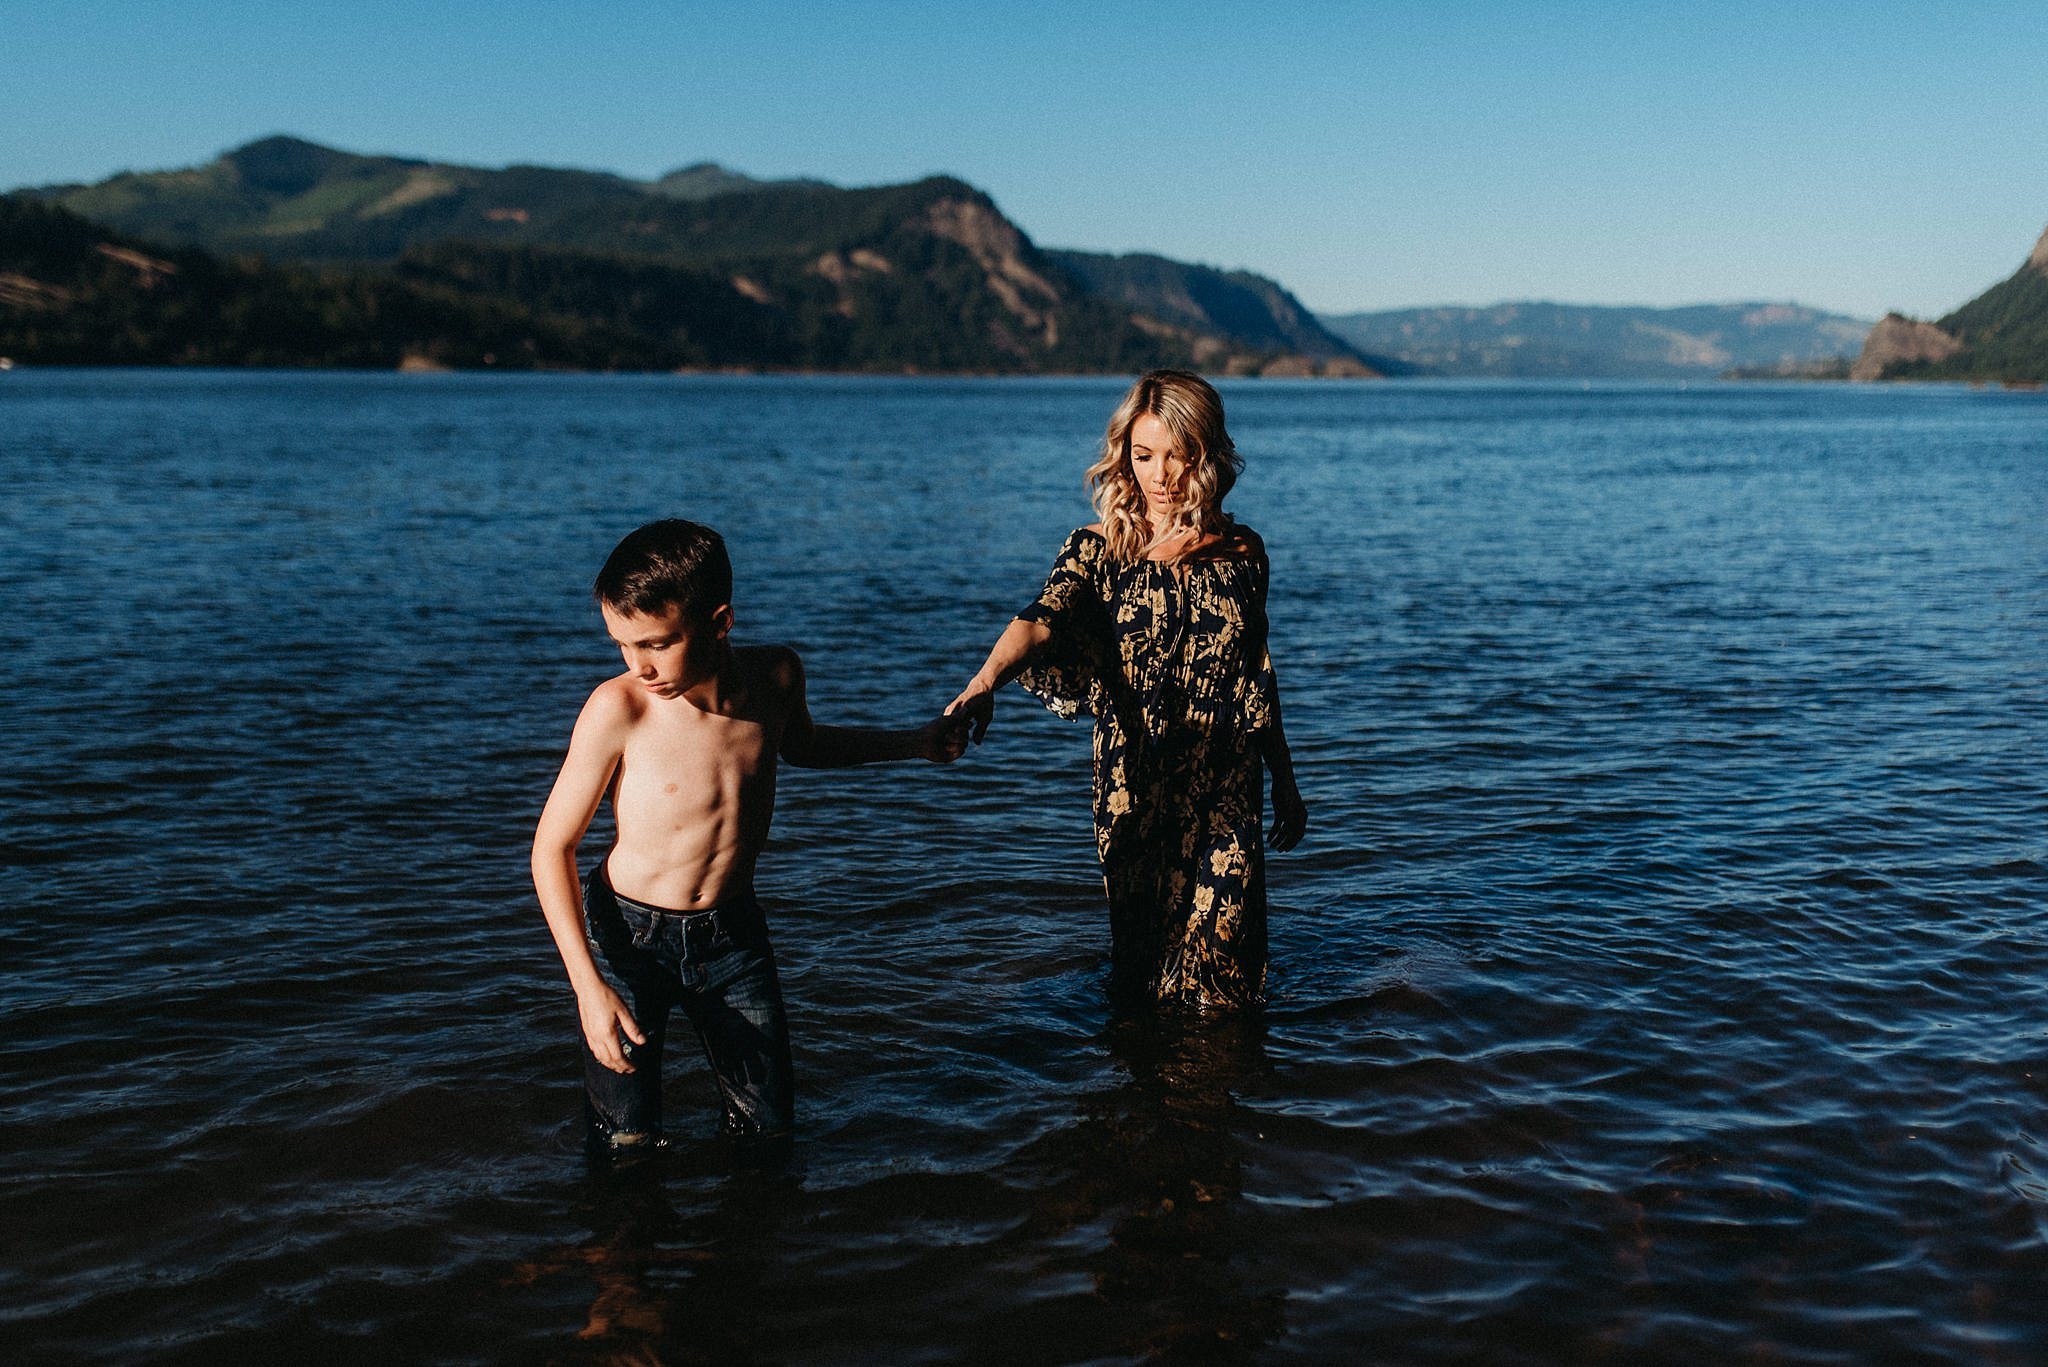 twyla jones photography - treasure coast florida - intimate couples session urban cowboy b&b | brooklyn New York_0068.jpg